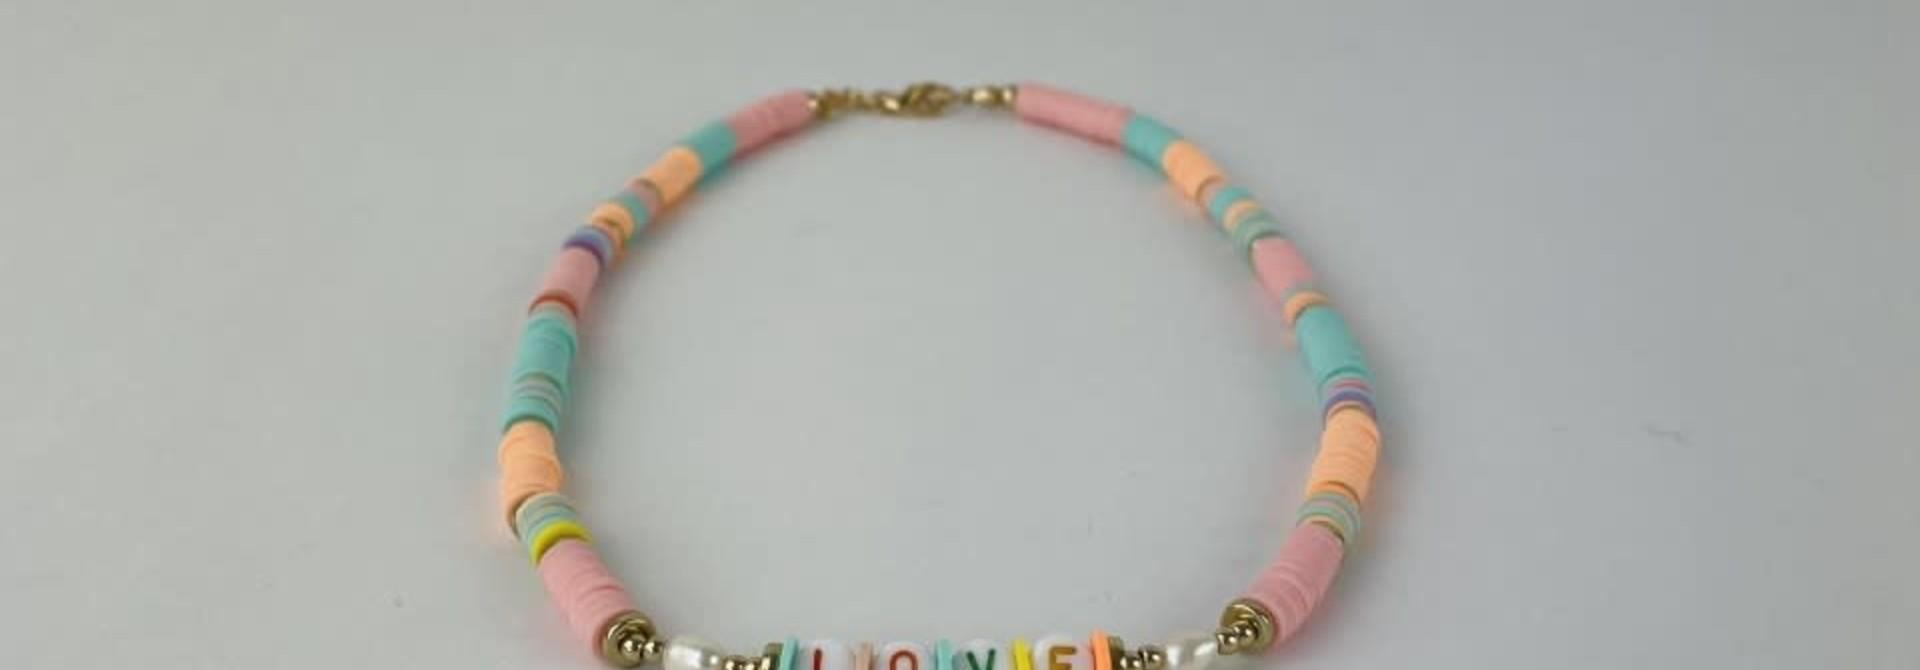 Rubberia fantasy necklace Pink